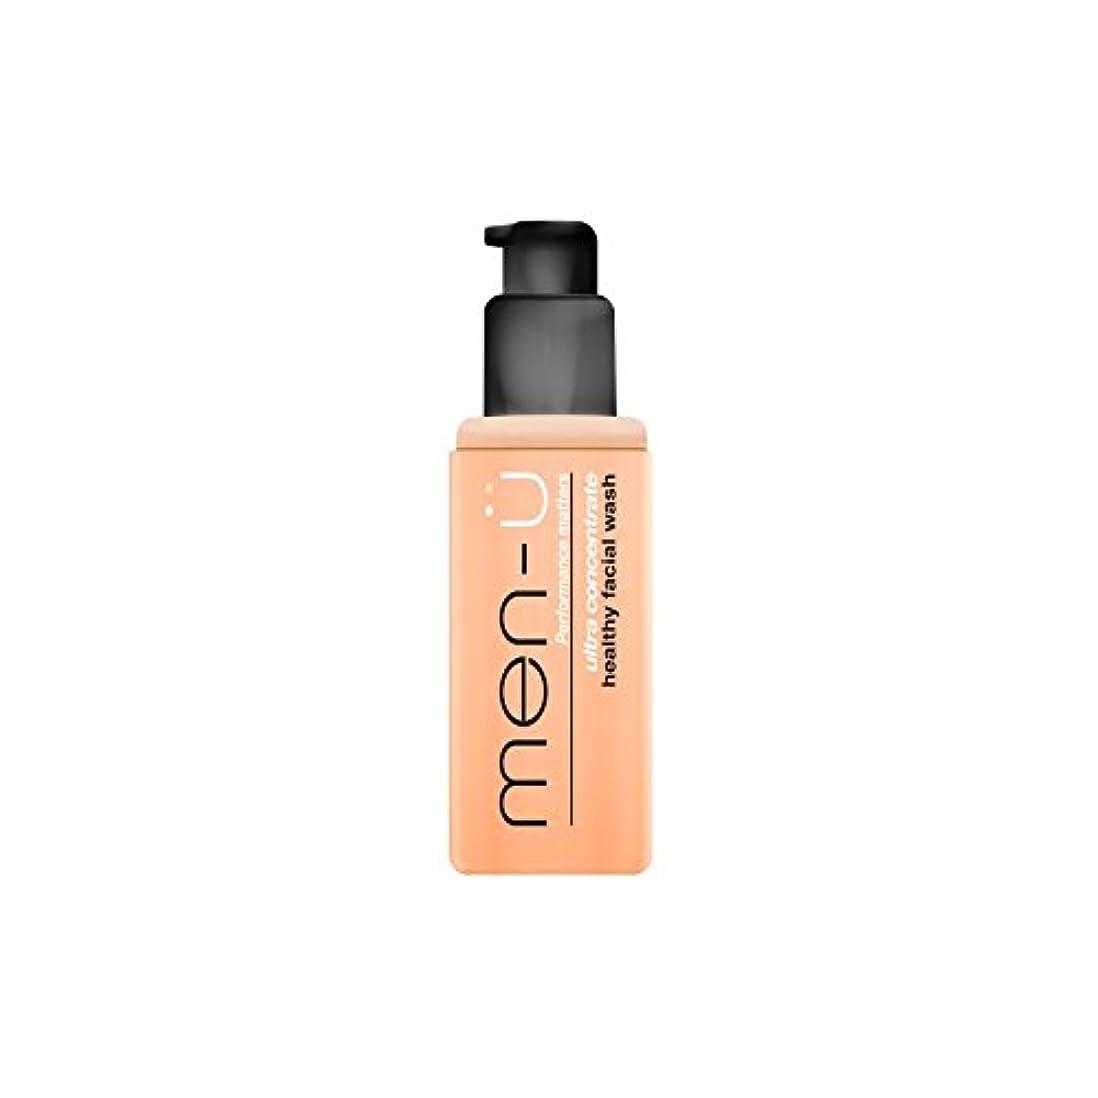 Men-? Healthy Facial Wash (100ml) - 男性-?健康洗顔料(100ミリリットル) [並行輸入品]